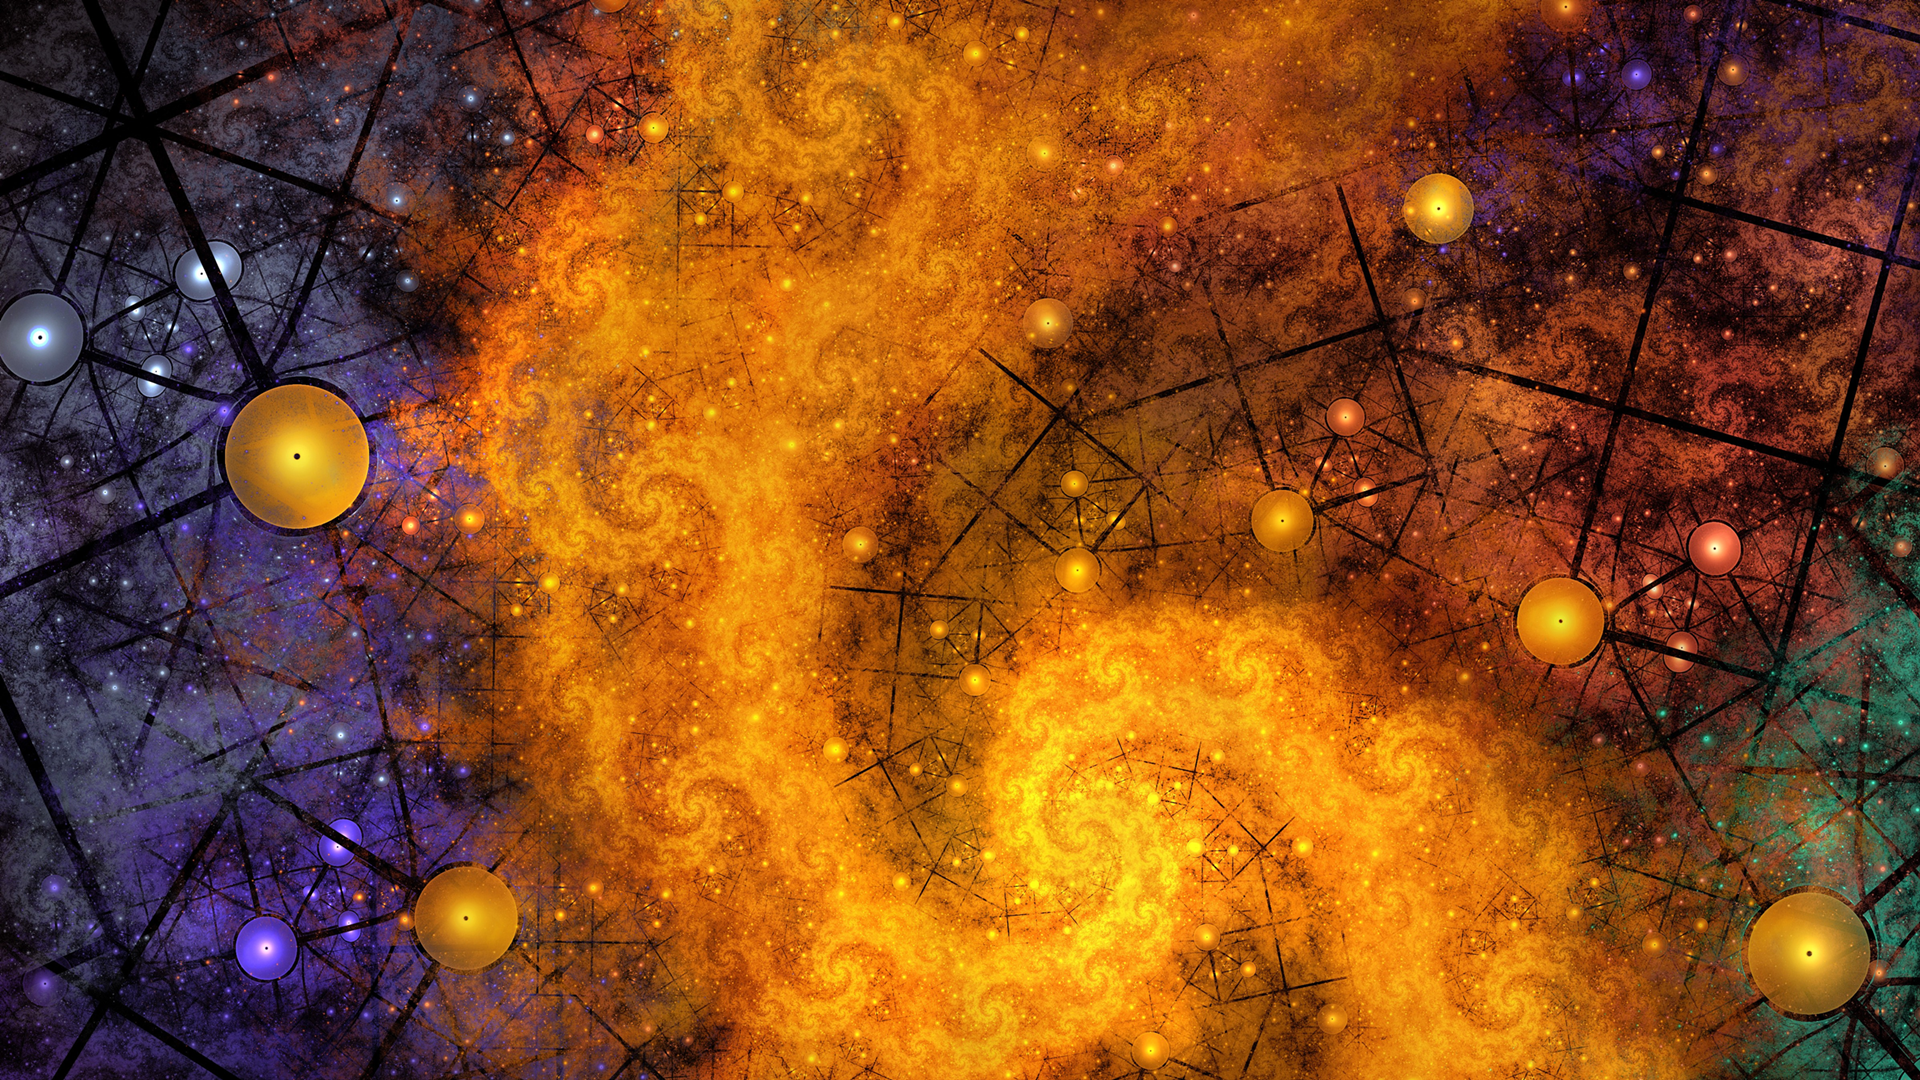 General 1920x1080 abstract digital art spiral colorful lines circle grunge artwork